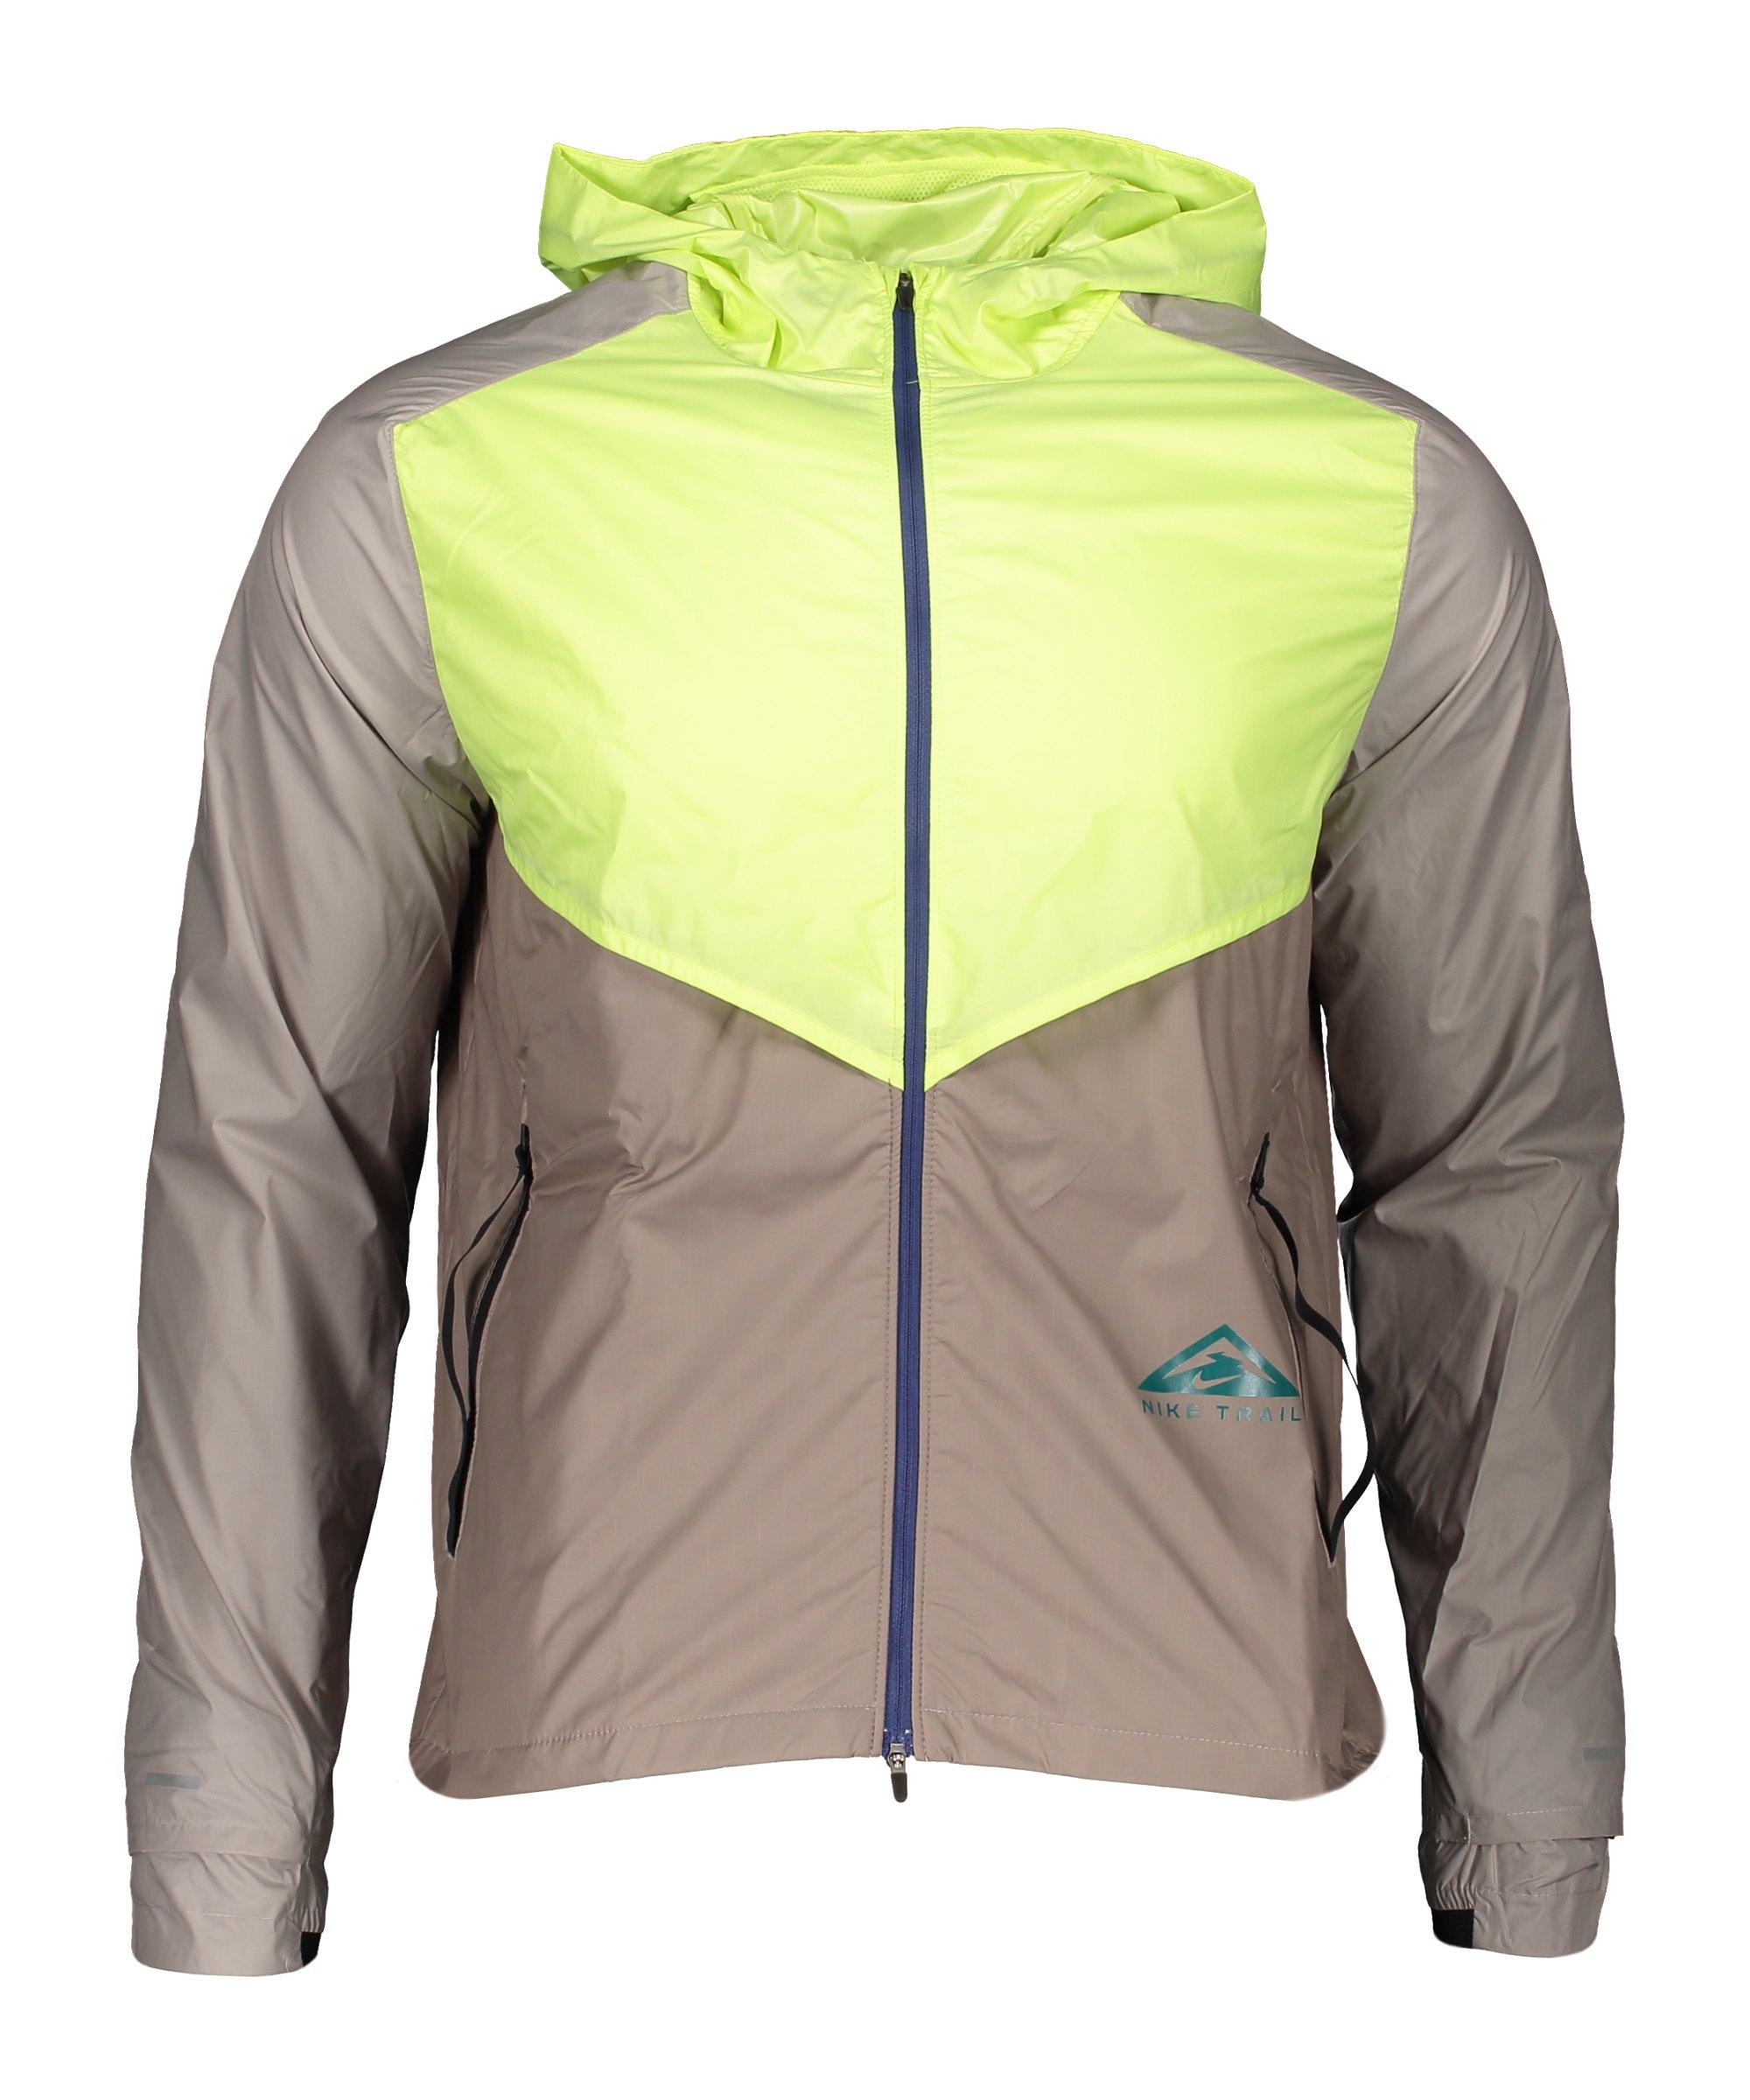 Nike Windrunner Trail Jacke Running Gelb Grau F736 - braun